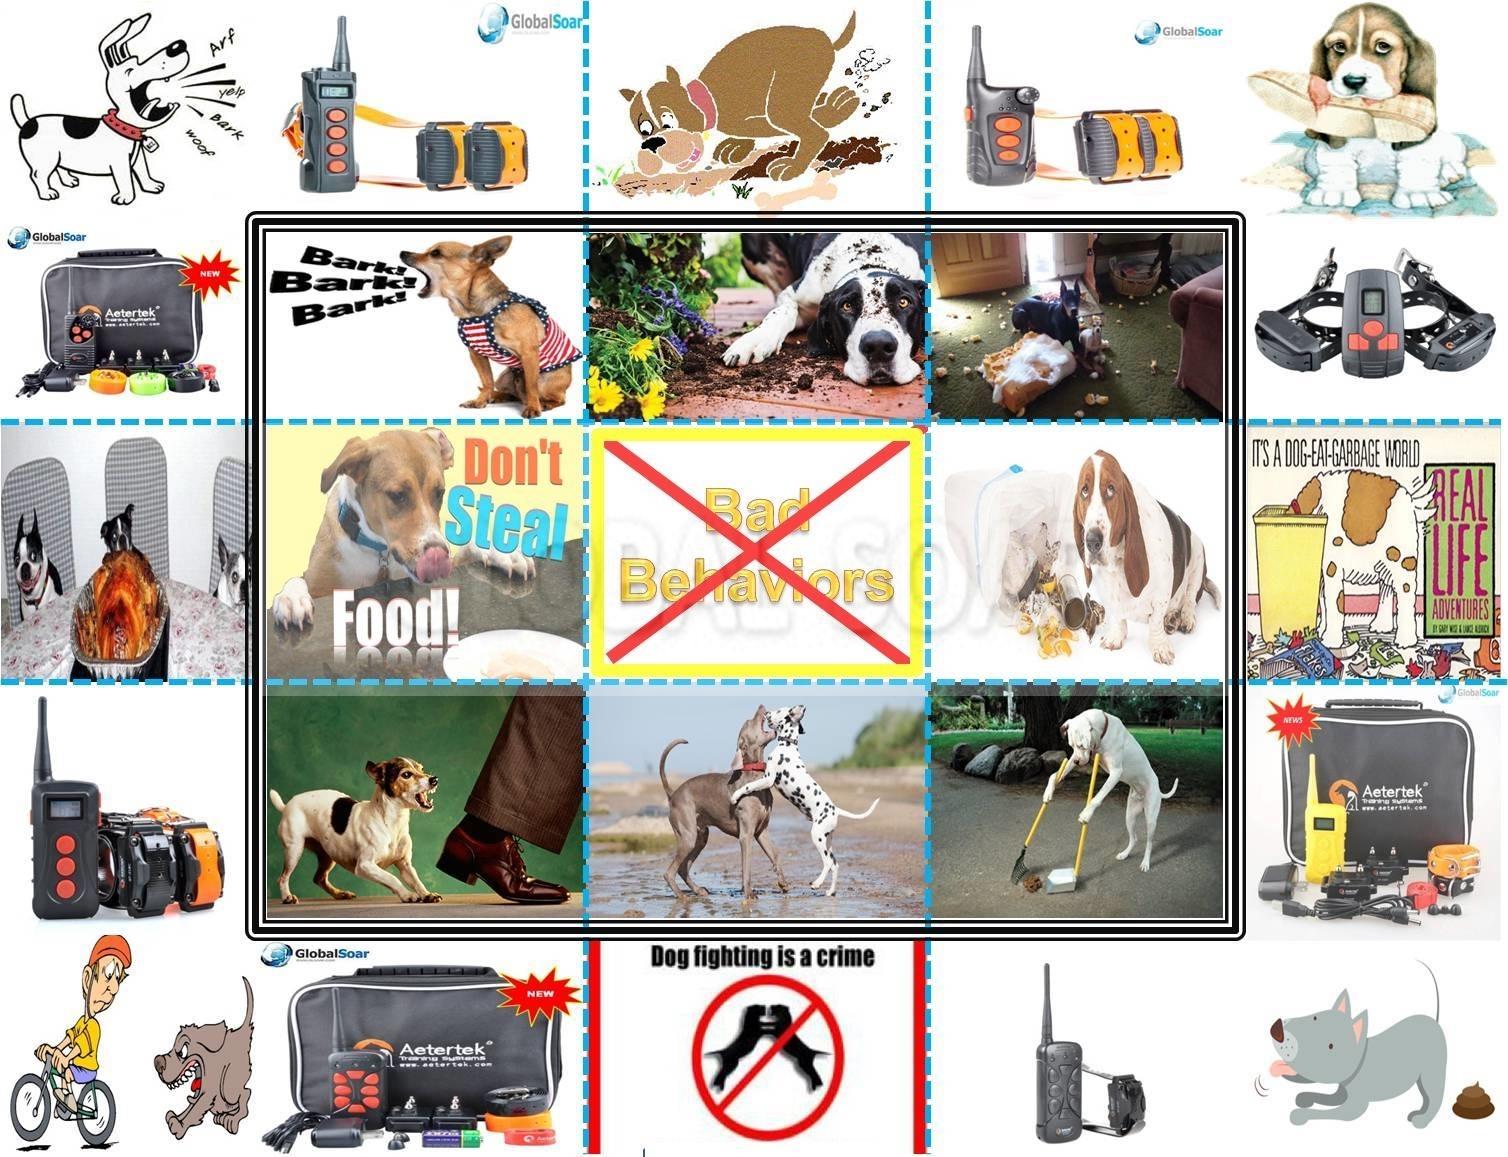 dog-ad1-1.jpg